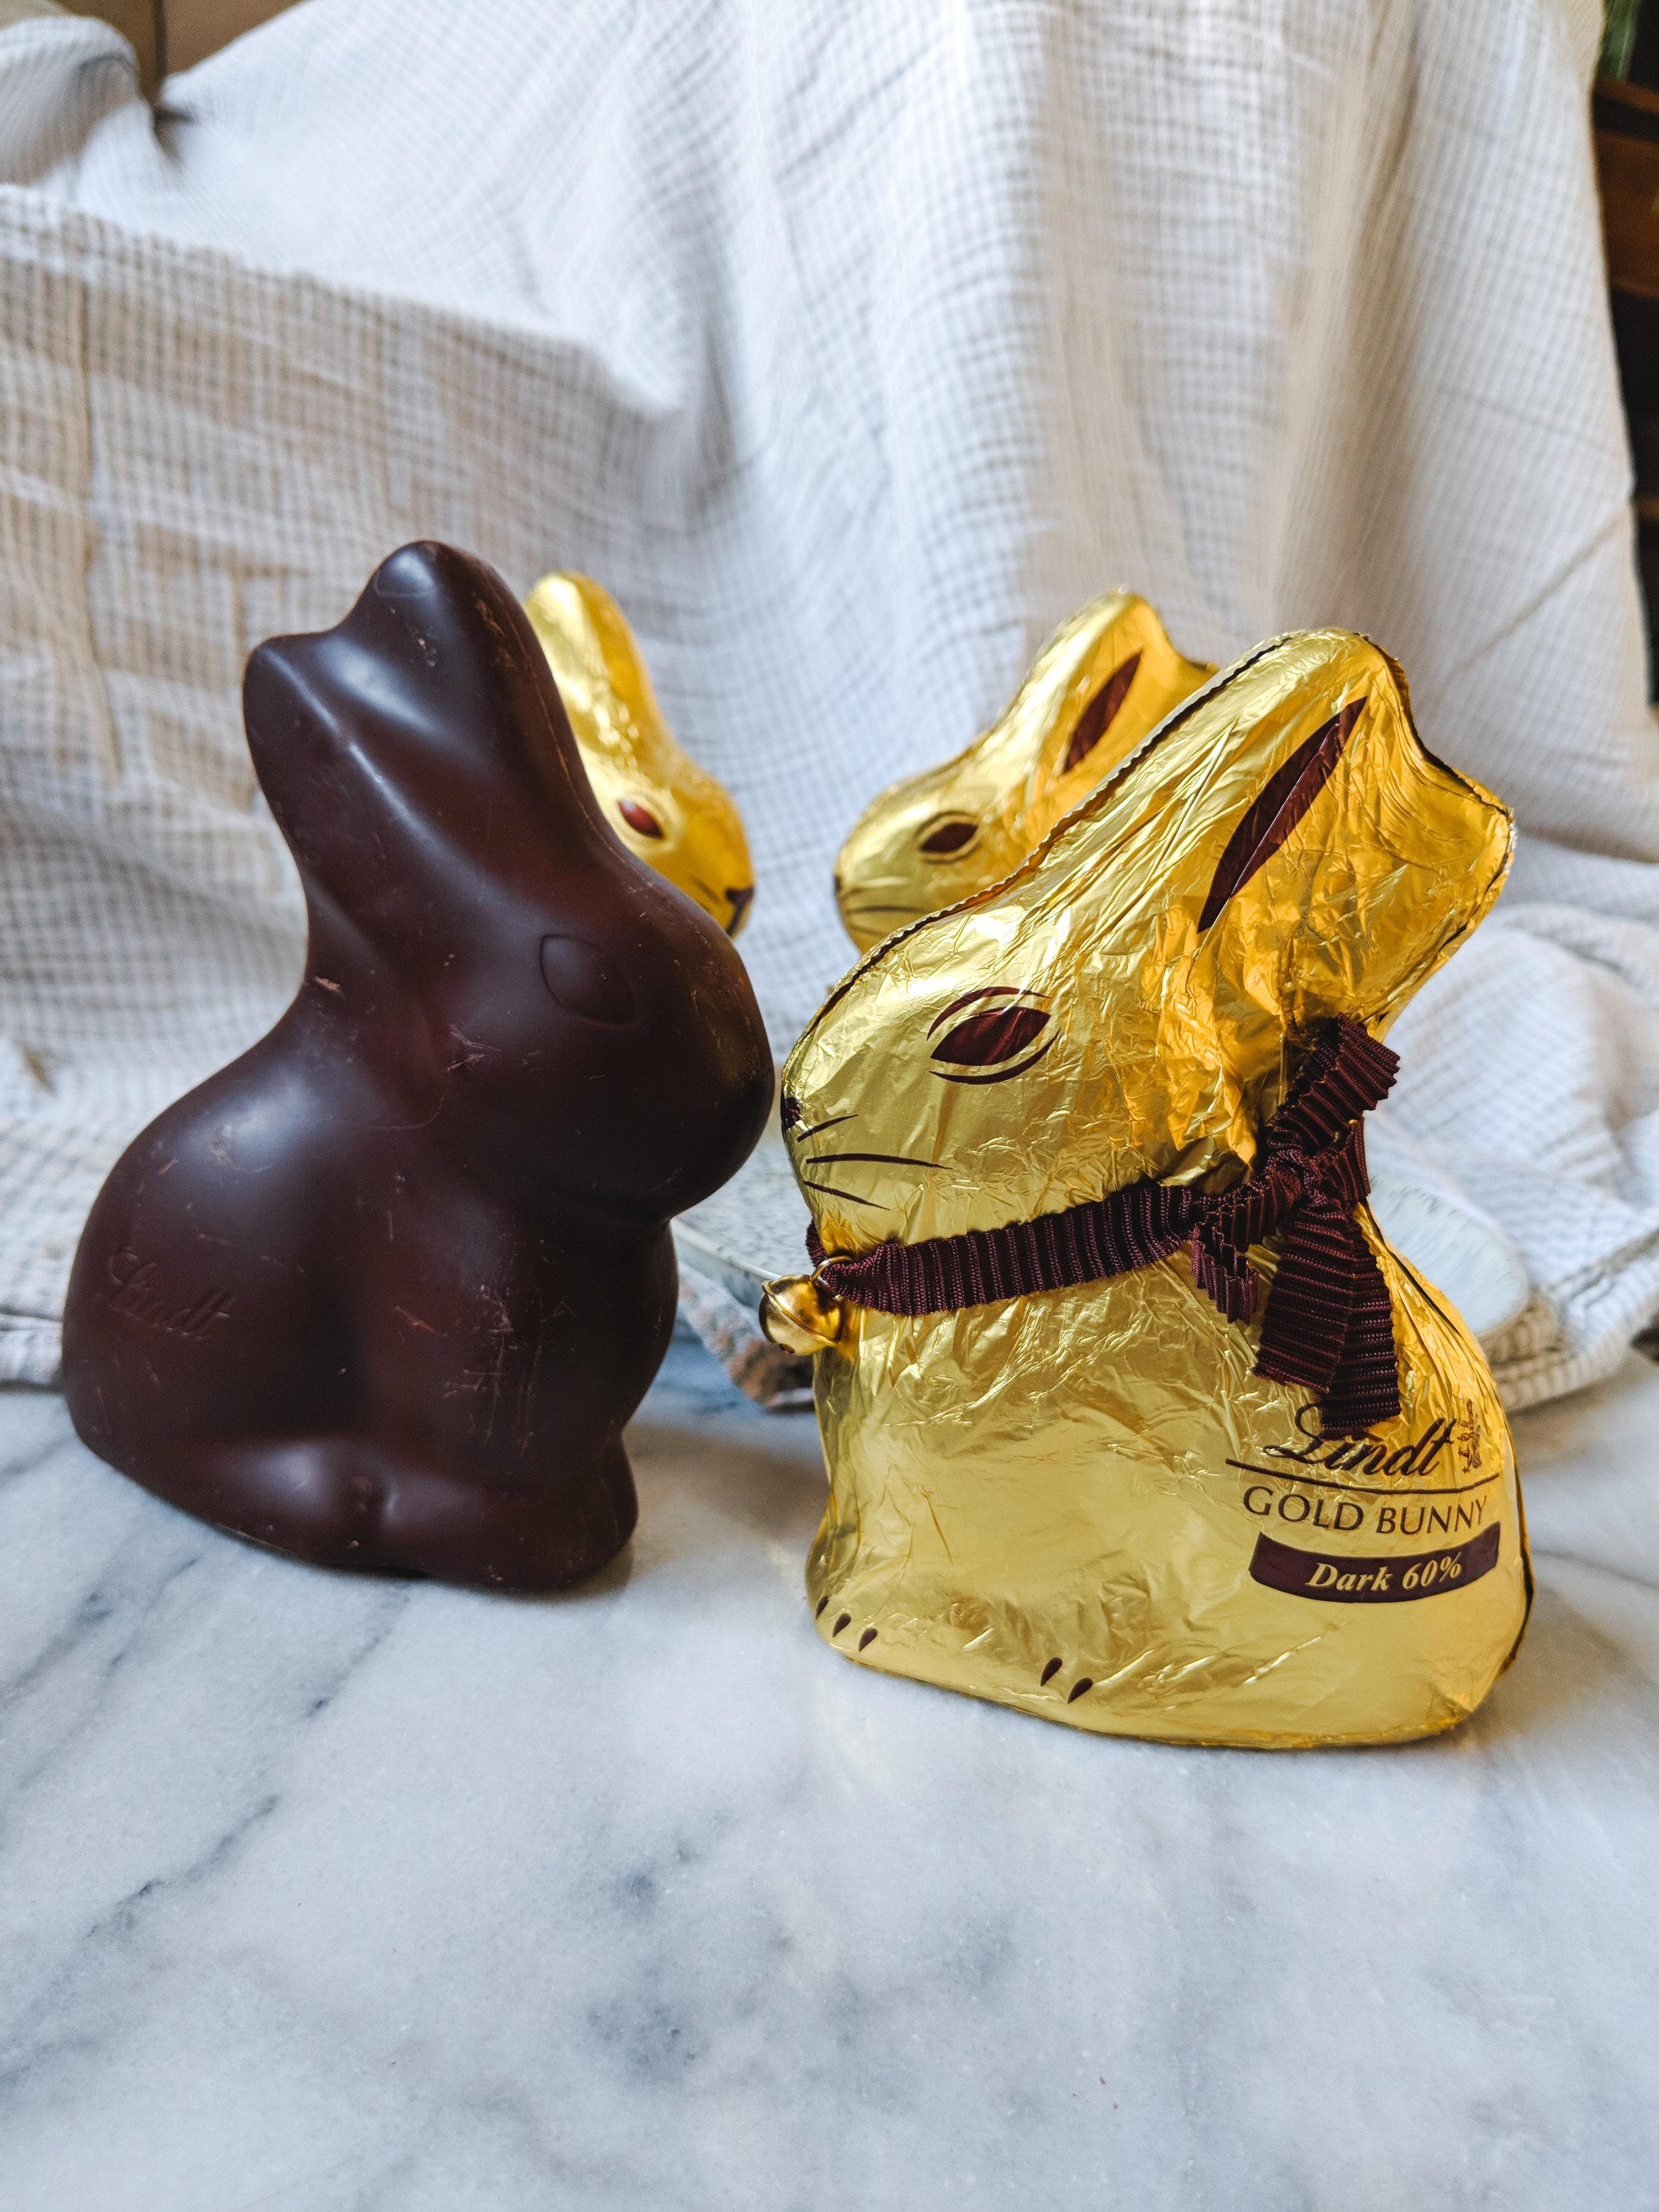 Vegan Chocolate Easter Eggs 2019 Roundup Serena Lee